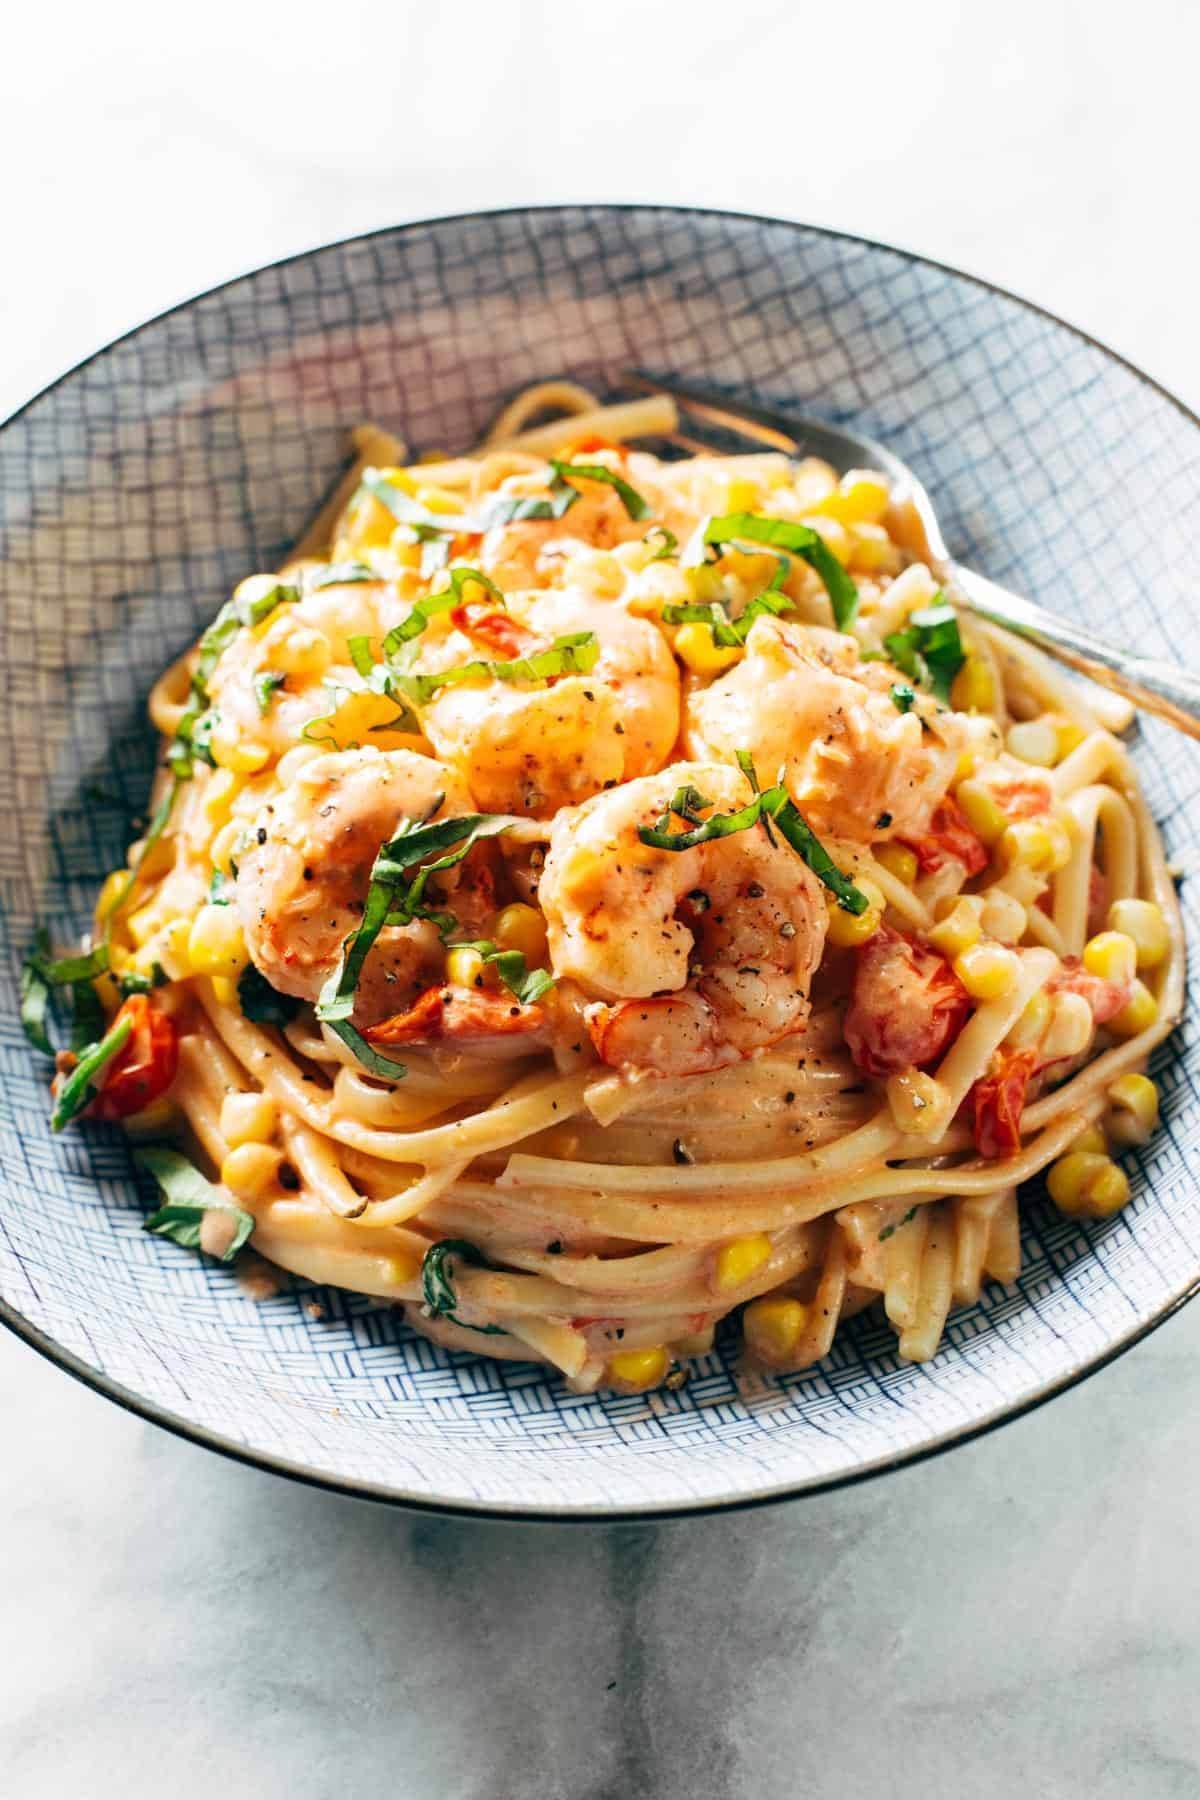 Creamy shrimp pasta in a bowl.